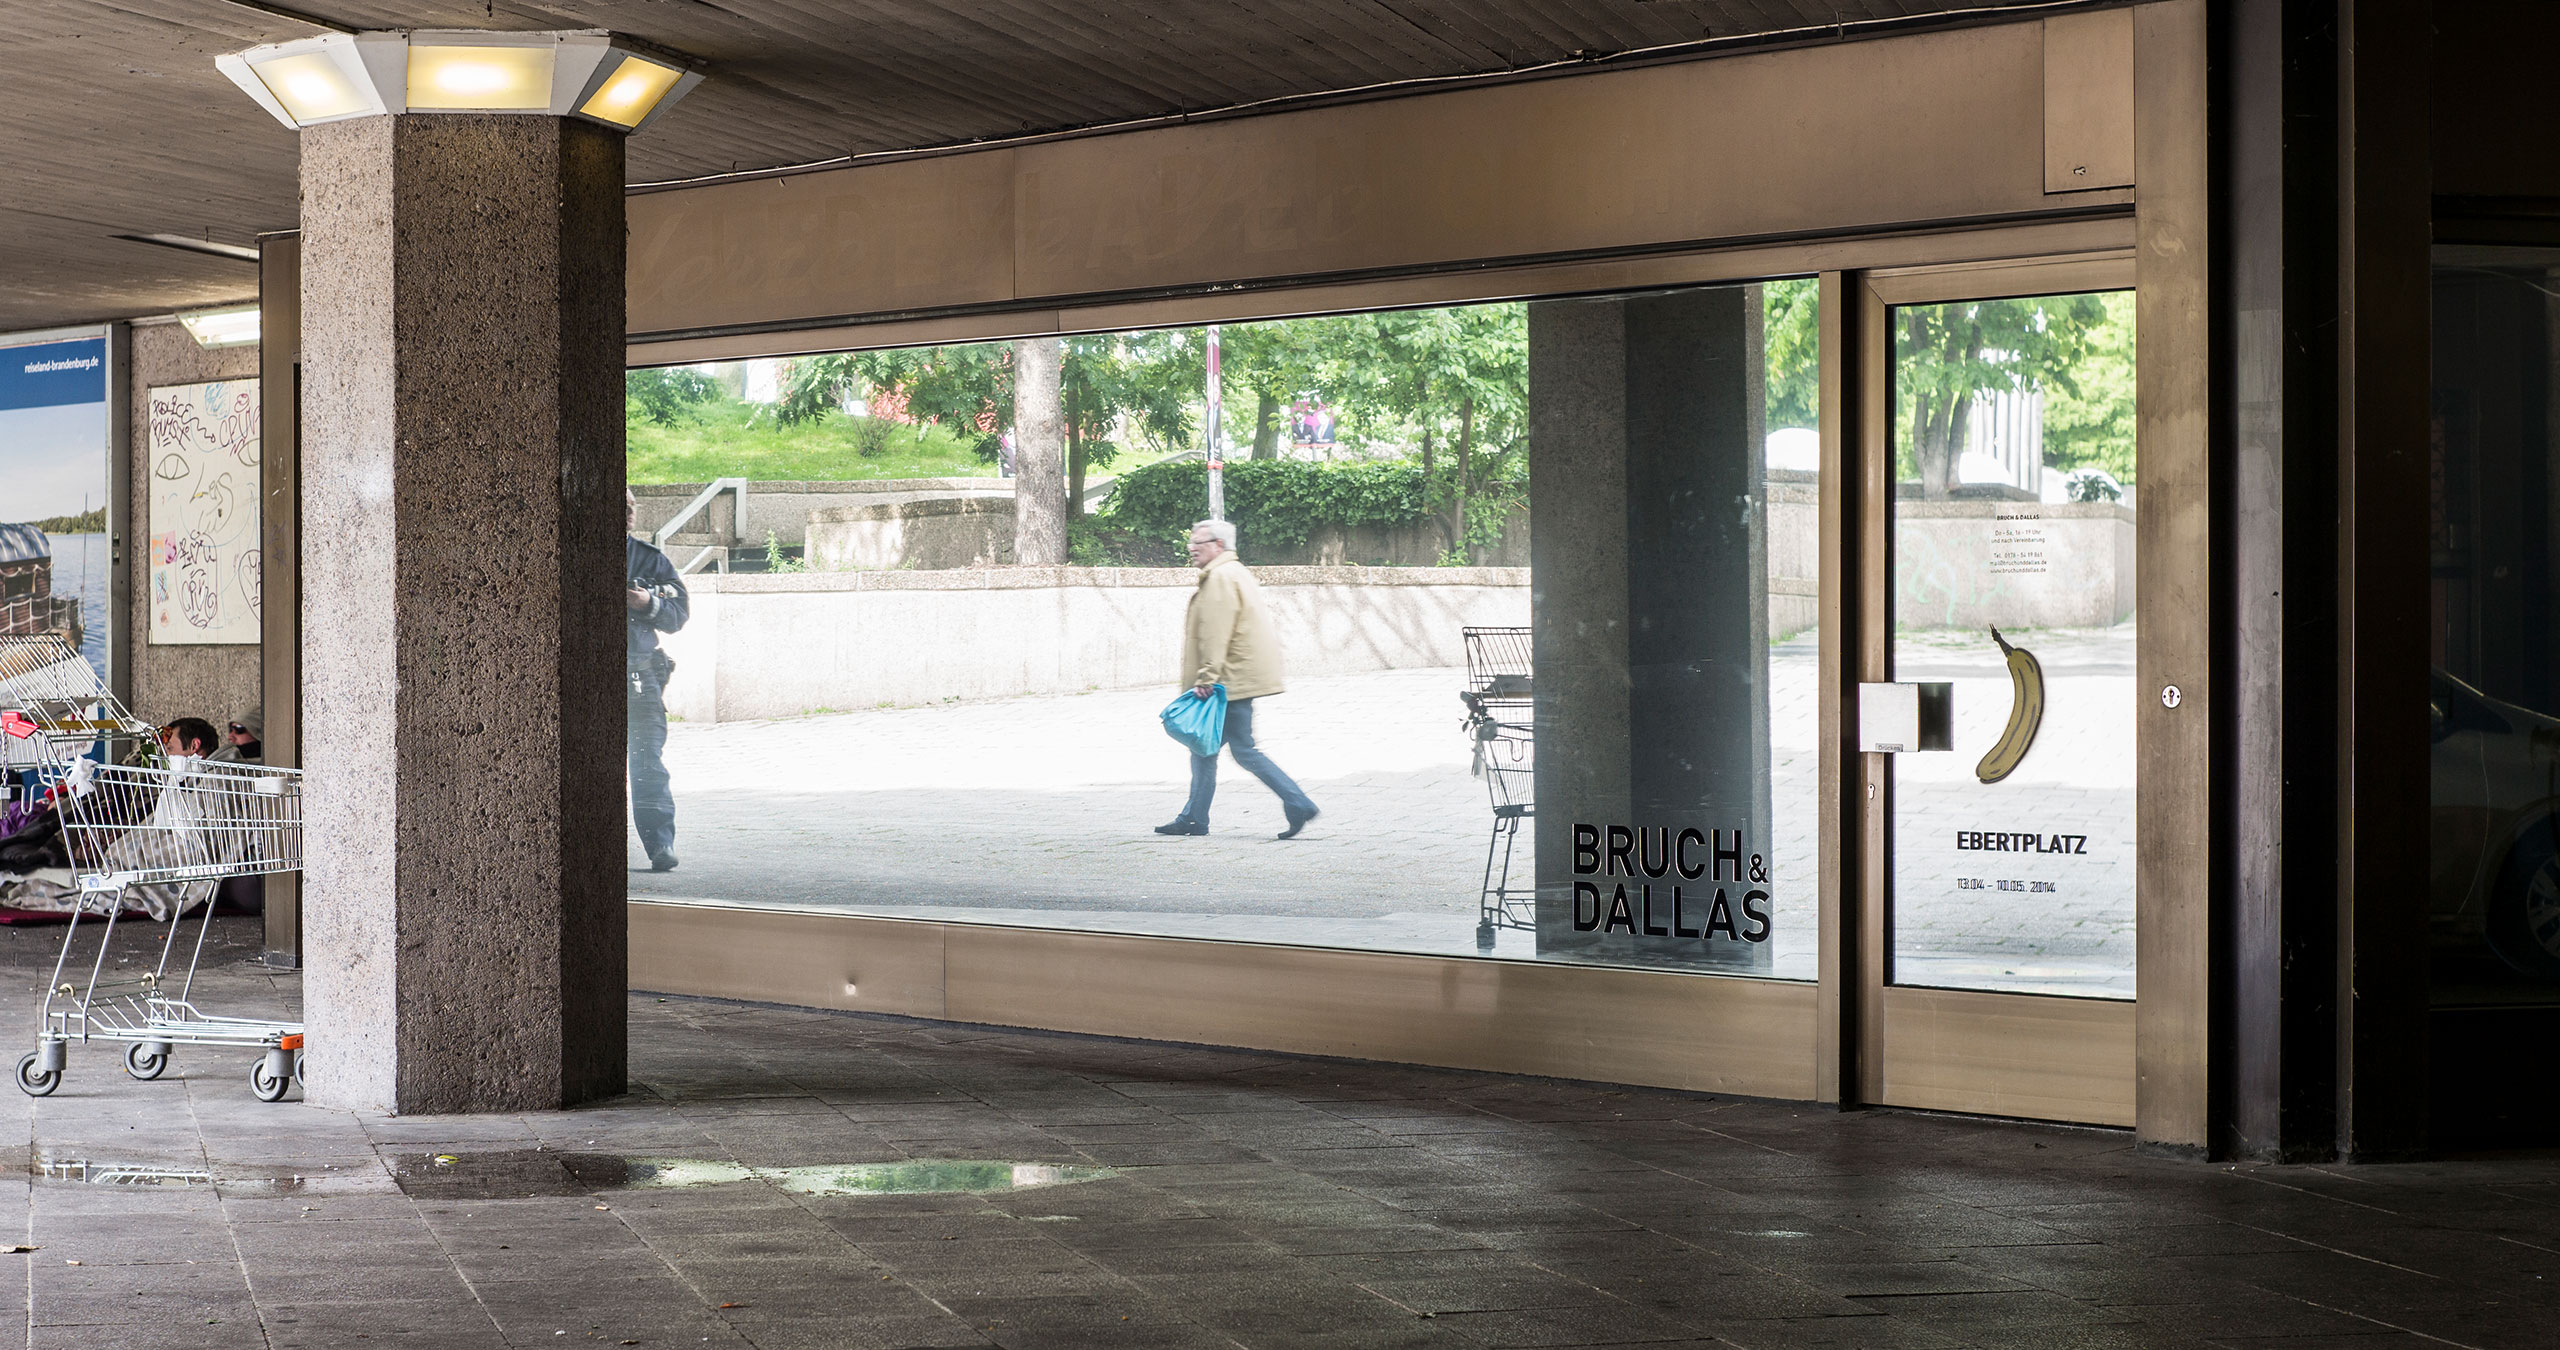 elisabeth-windisch-ebertplatz-003